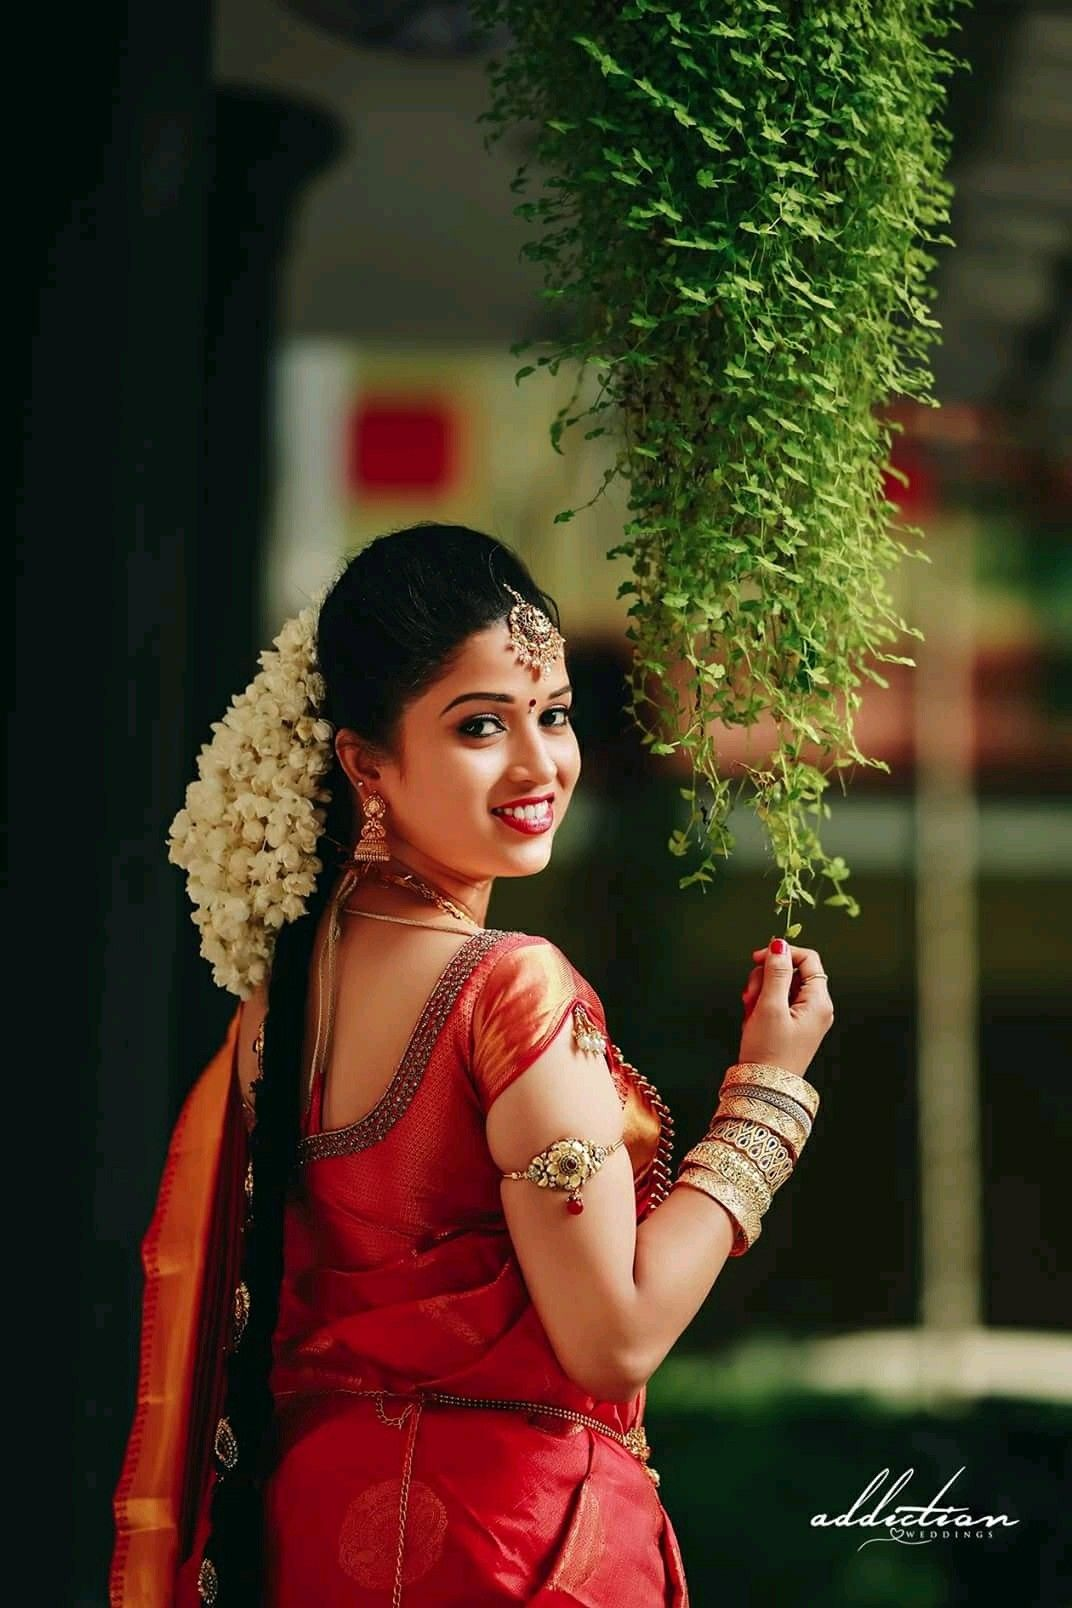 pin by ashok kumar on best makeup in 2019   kerala wedding